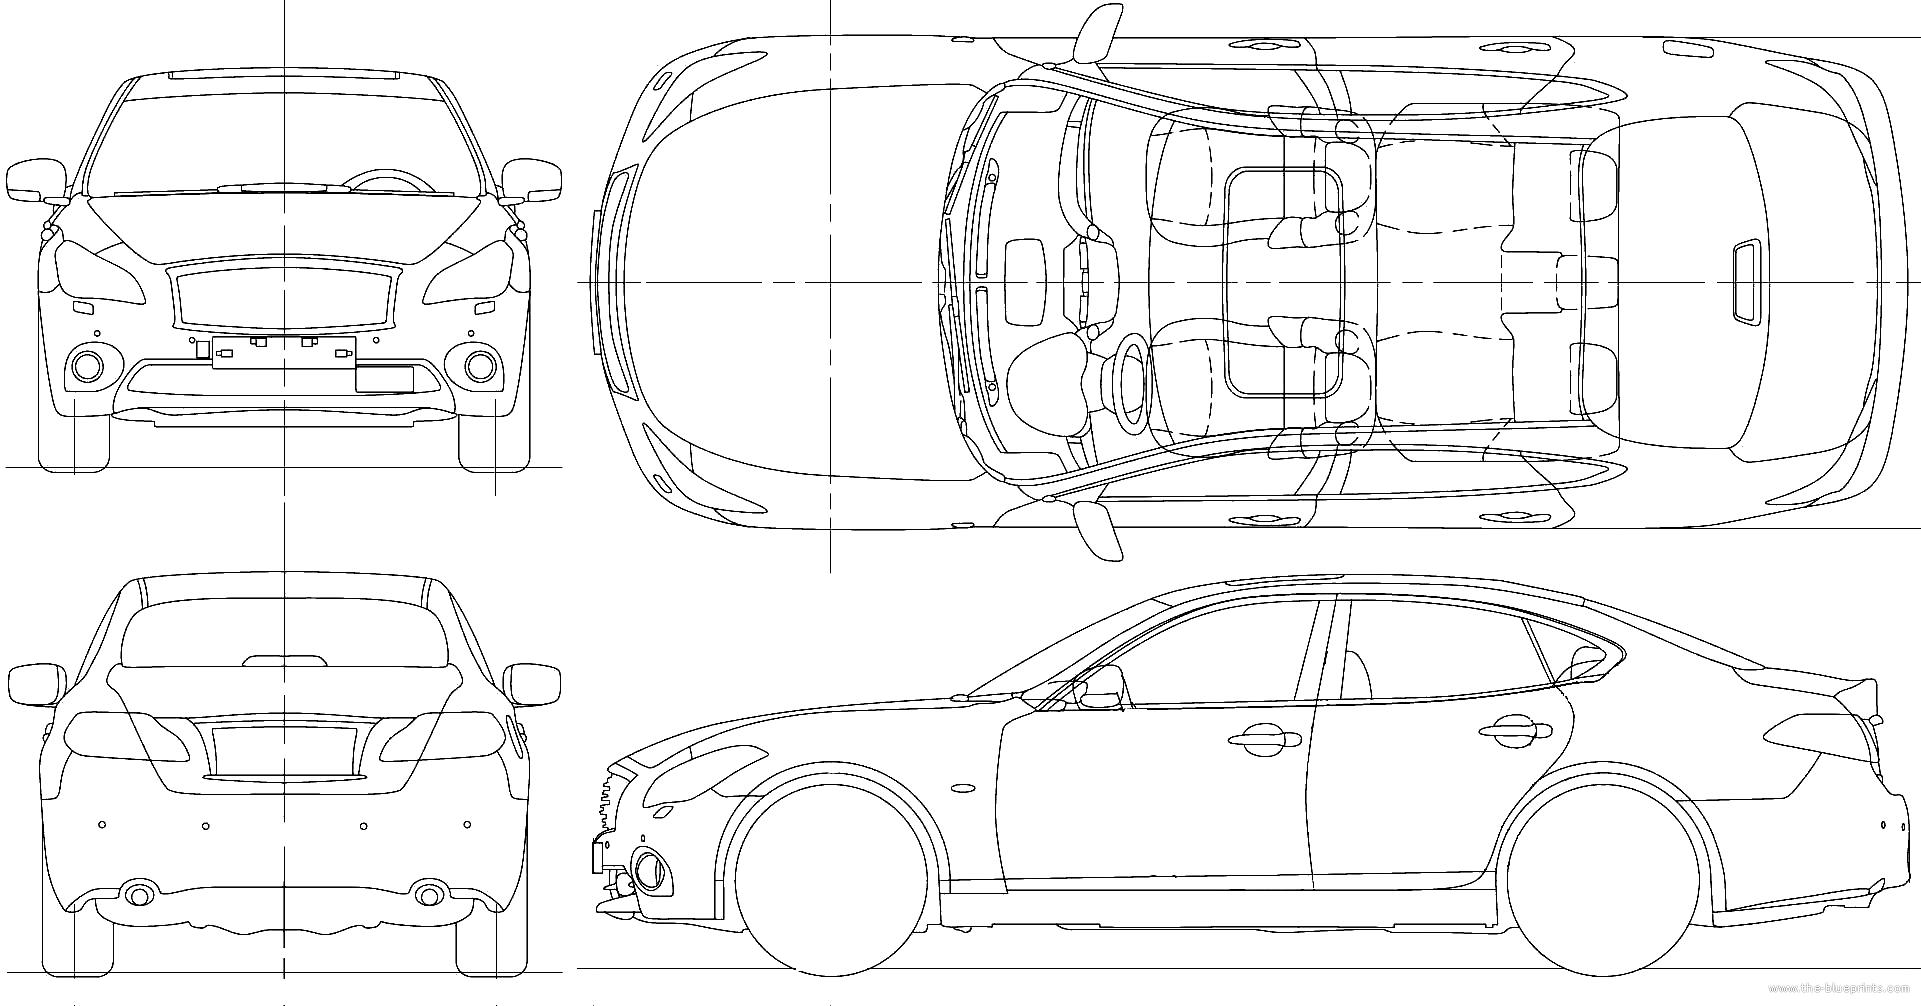 Blueprints Gt Cars Gt Infiniti Gt Infiniti M45